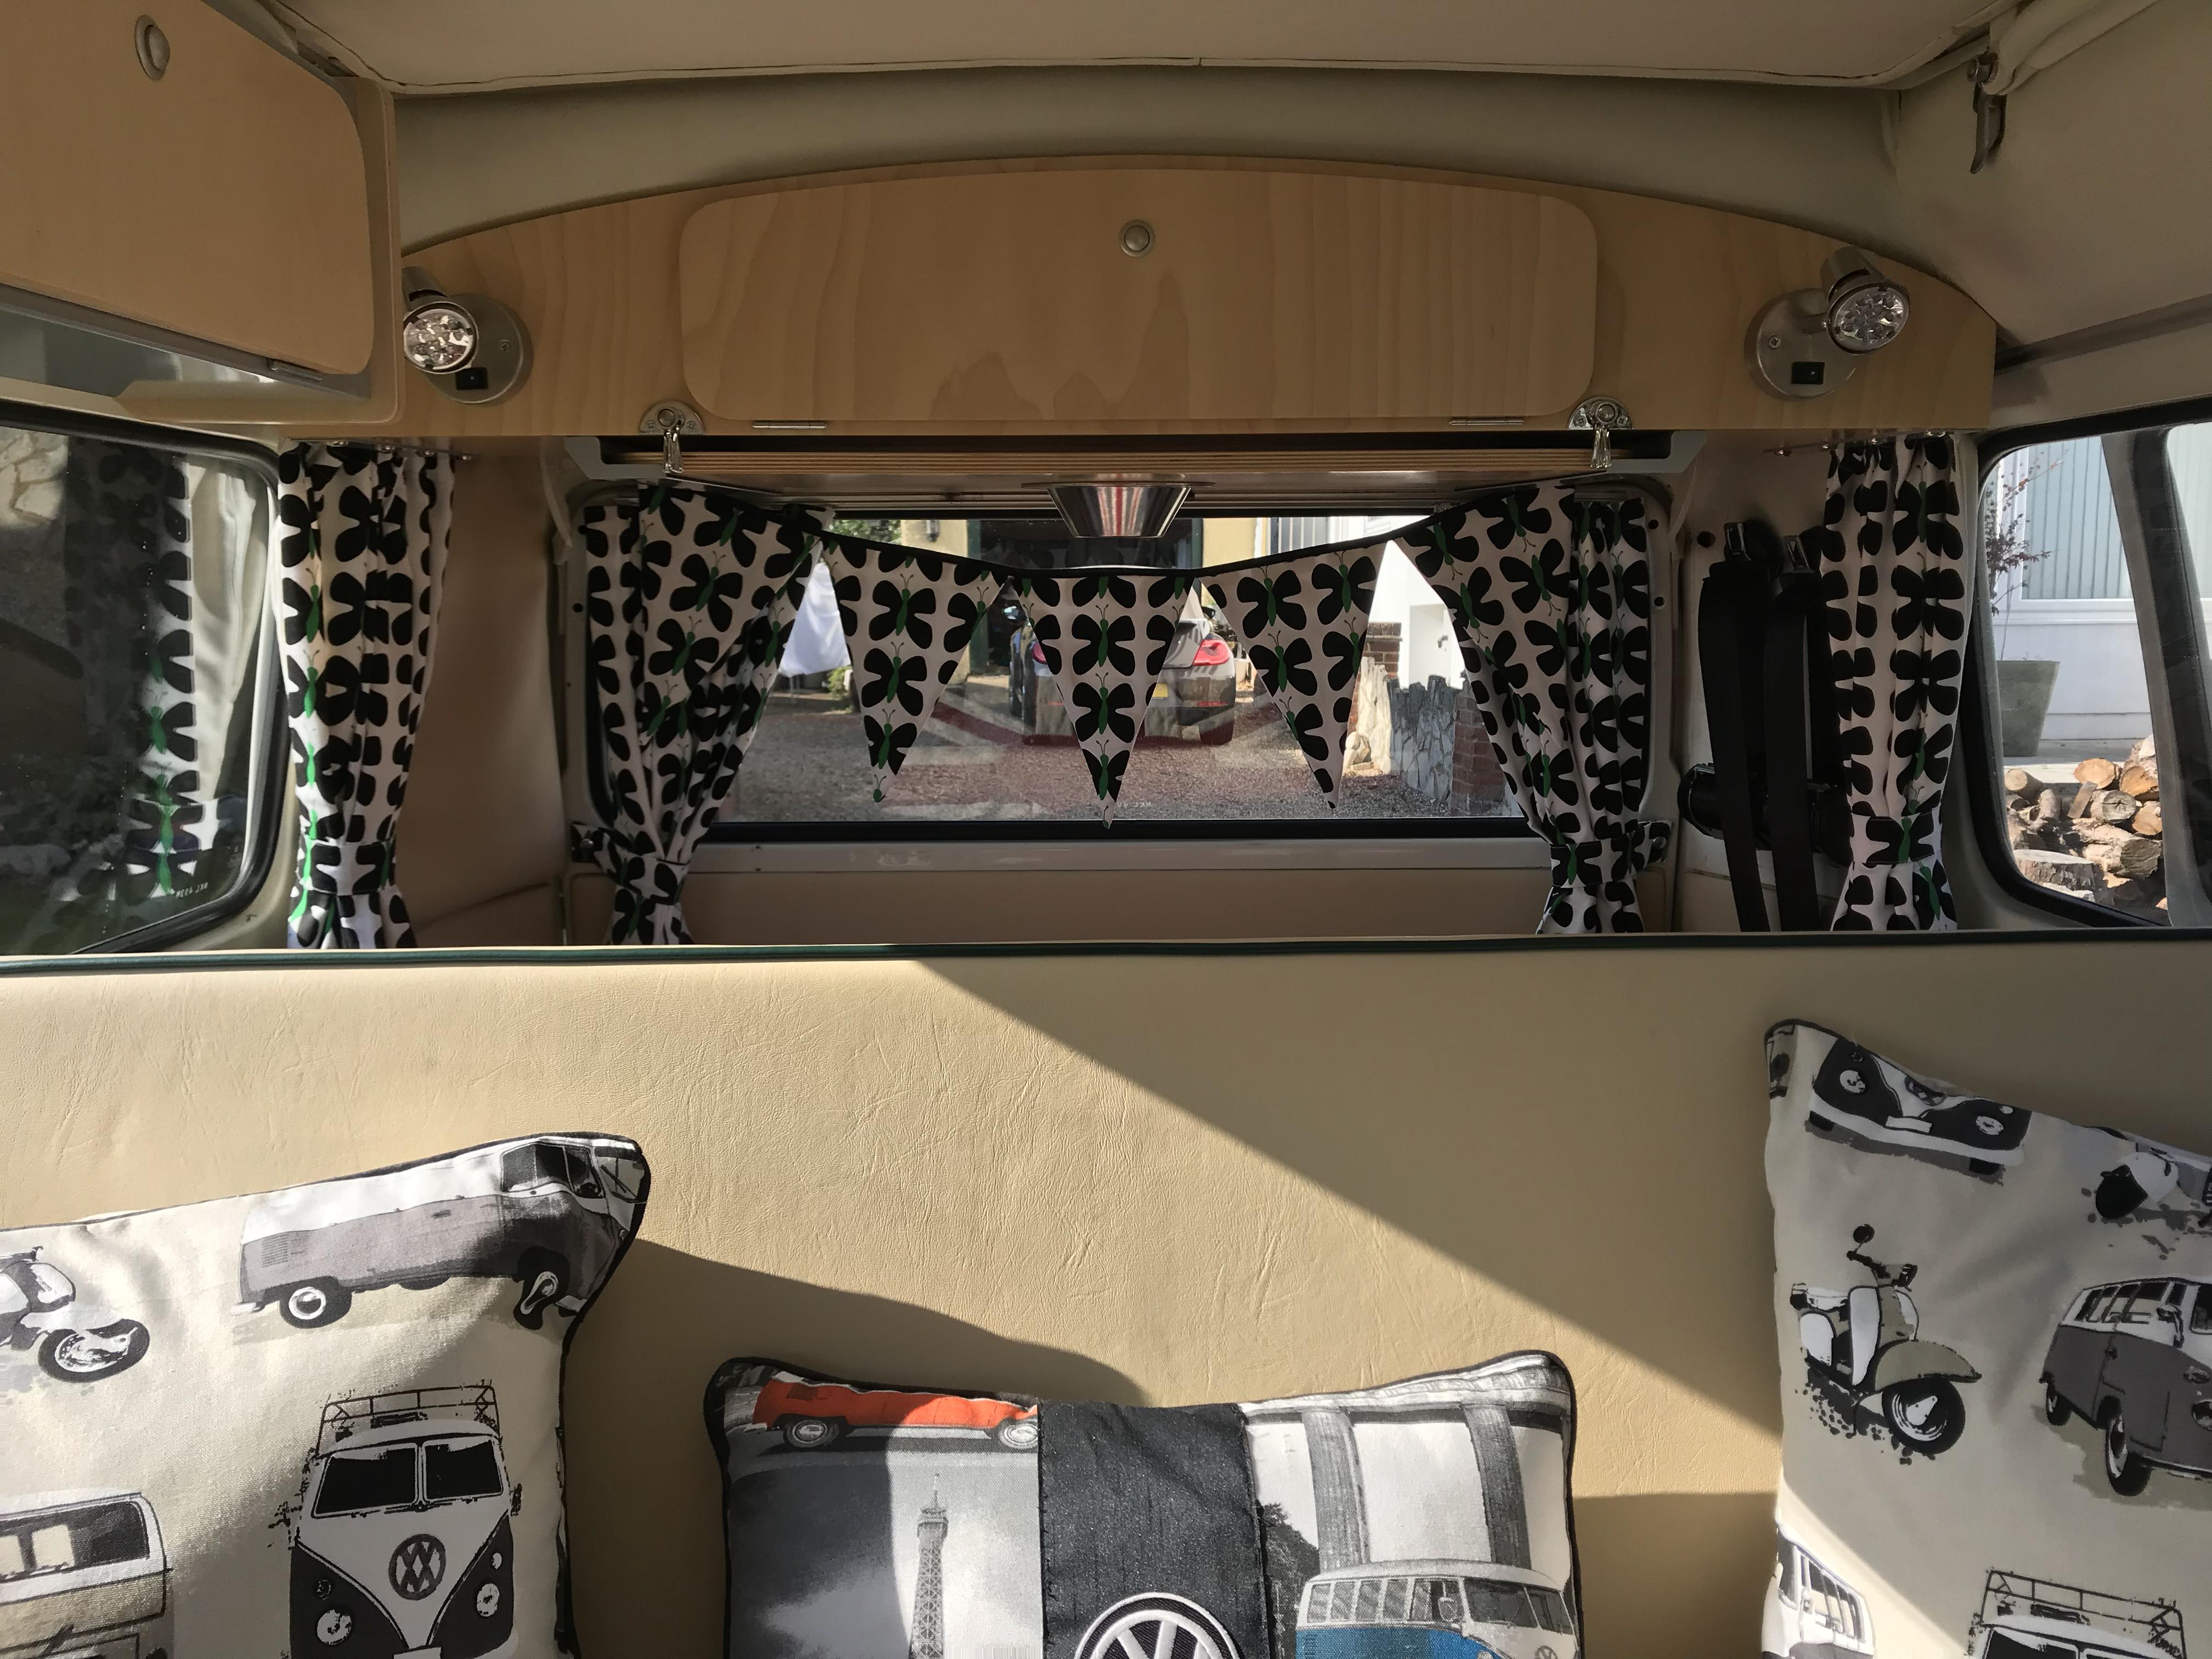 rhd-vw-camper-for-sale